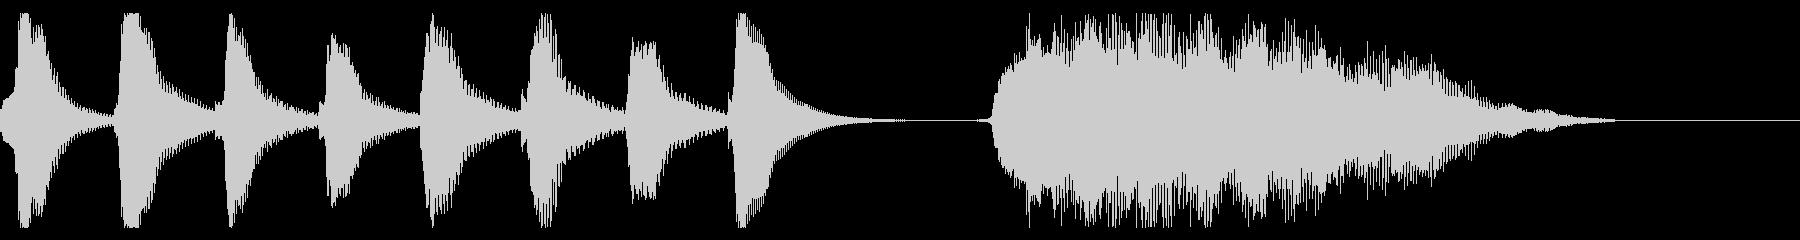 Marinicaの未再生の波形